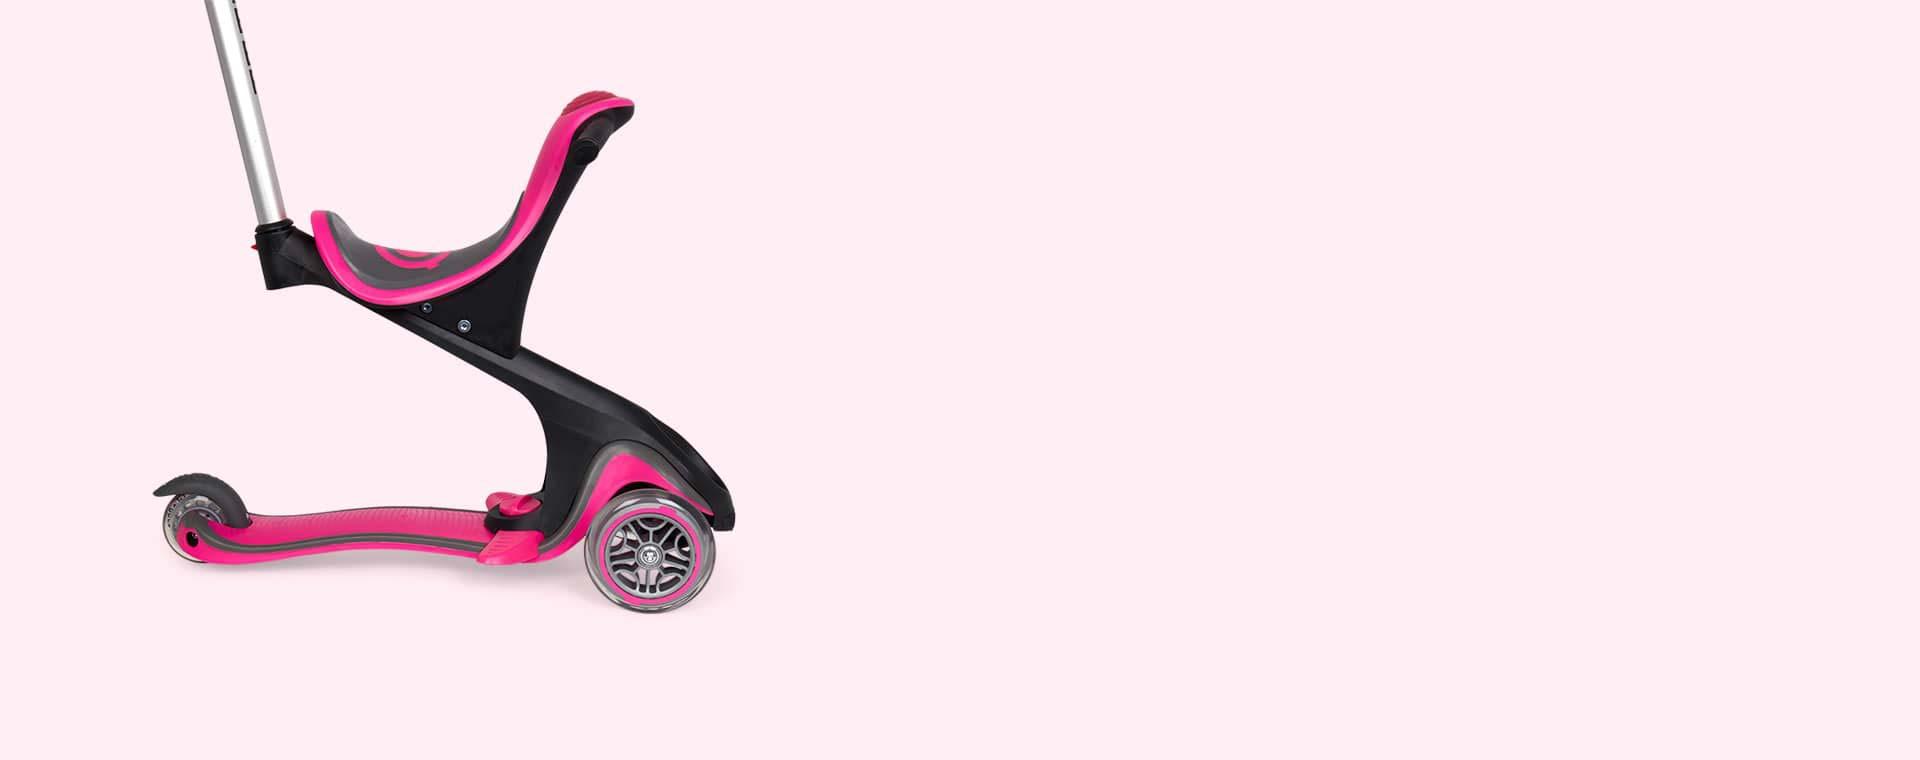 Deep Pink Globber Evo Comfort Scooter